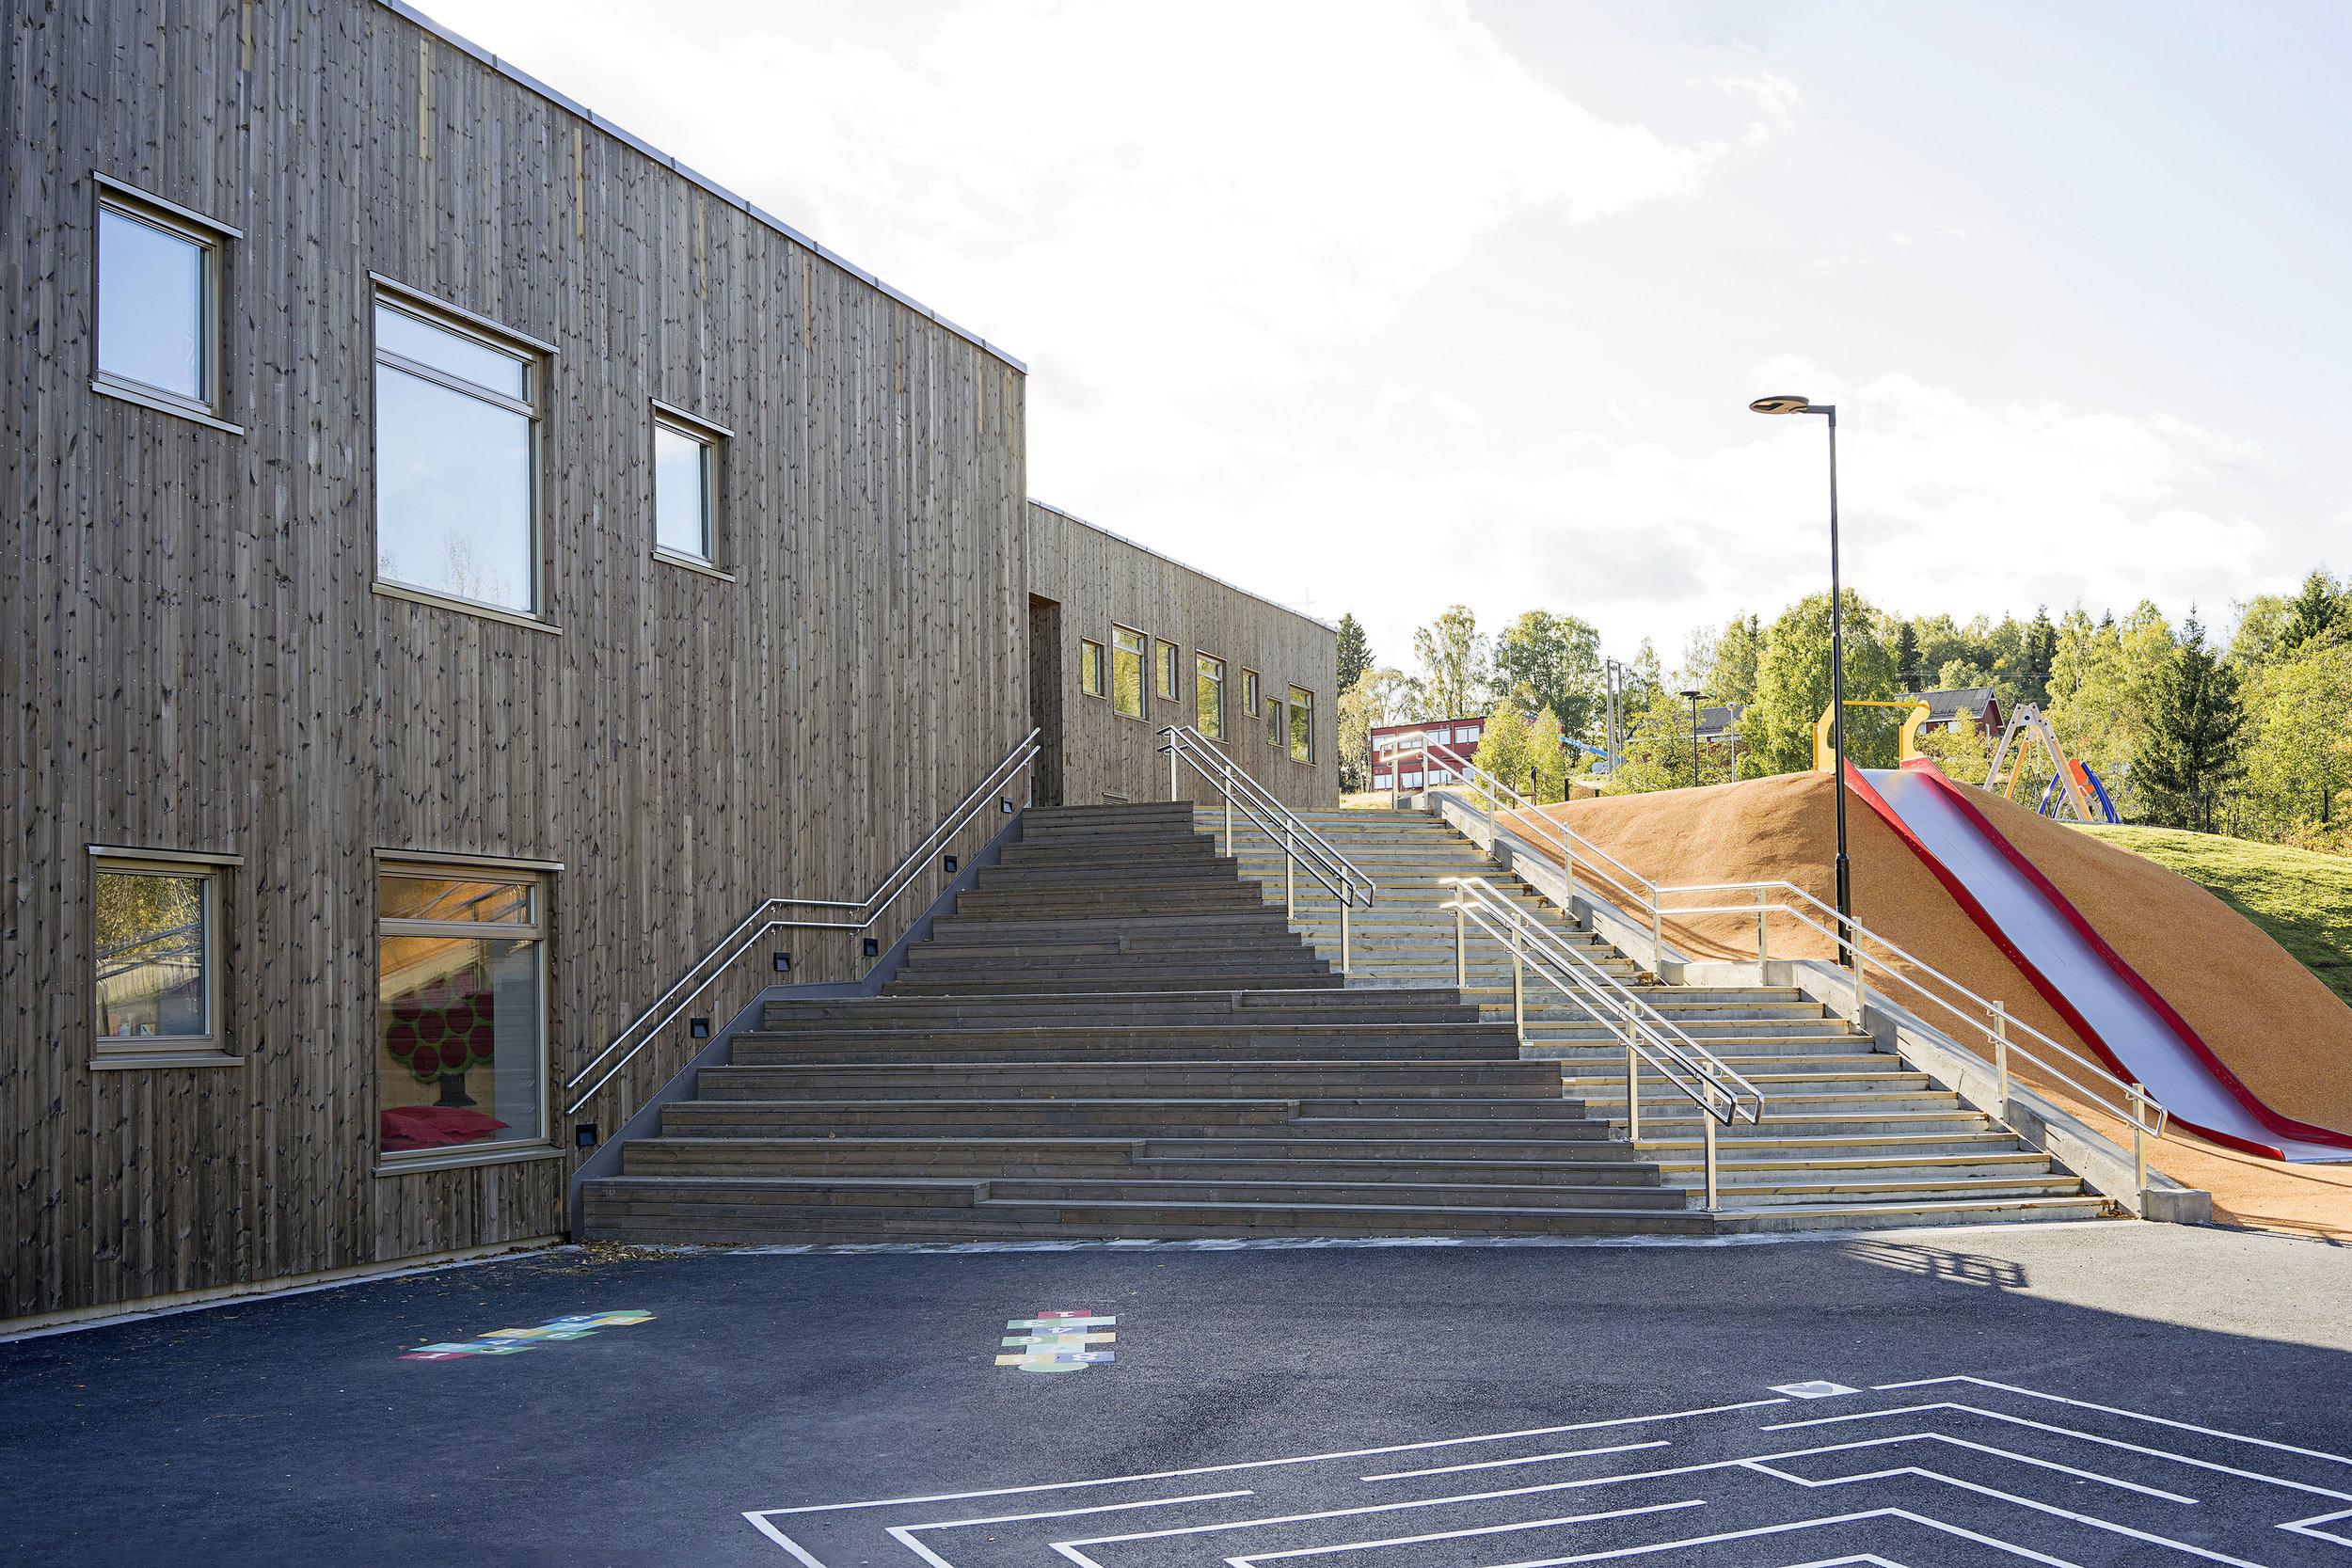 Planforum Arkitekter_Ytre Enebakk skole_Foto Eli Haugen Sandnes_Fasade 01.jpg